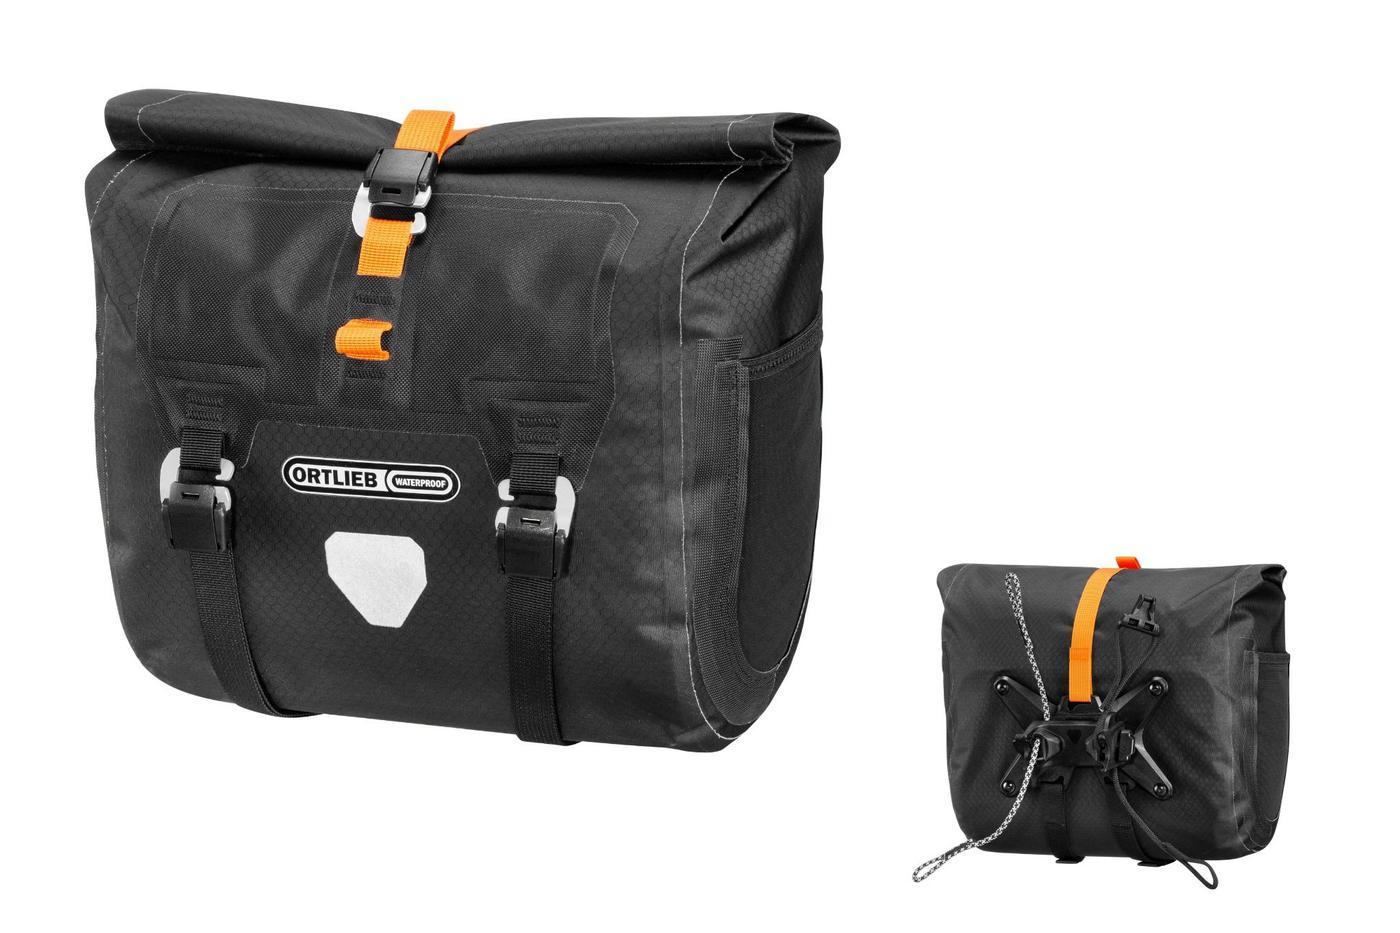 Ortlieb's Handlebar Pack QR